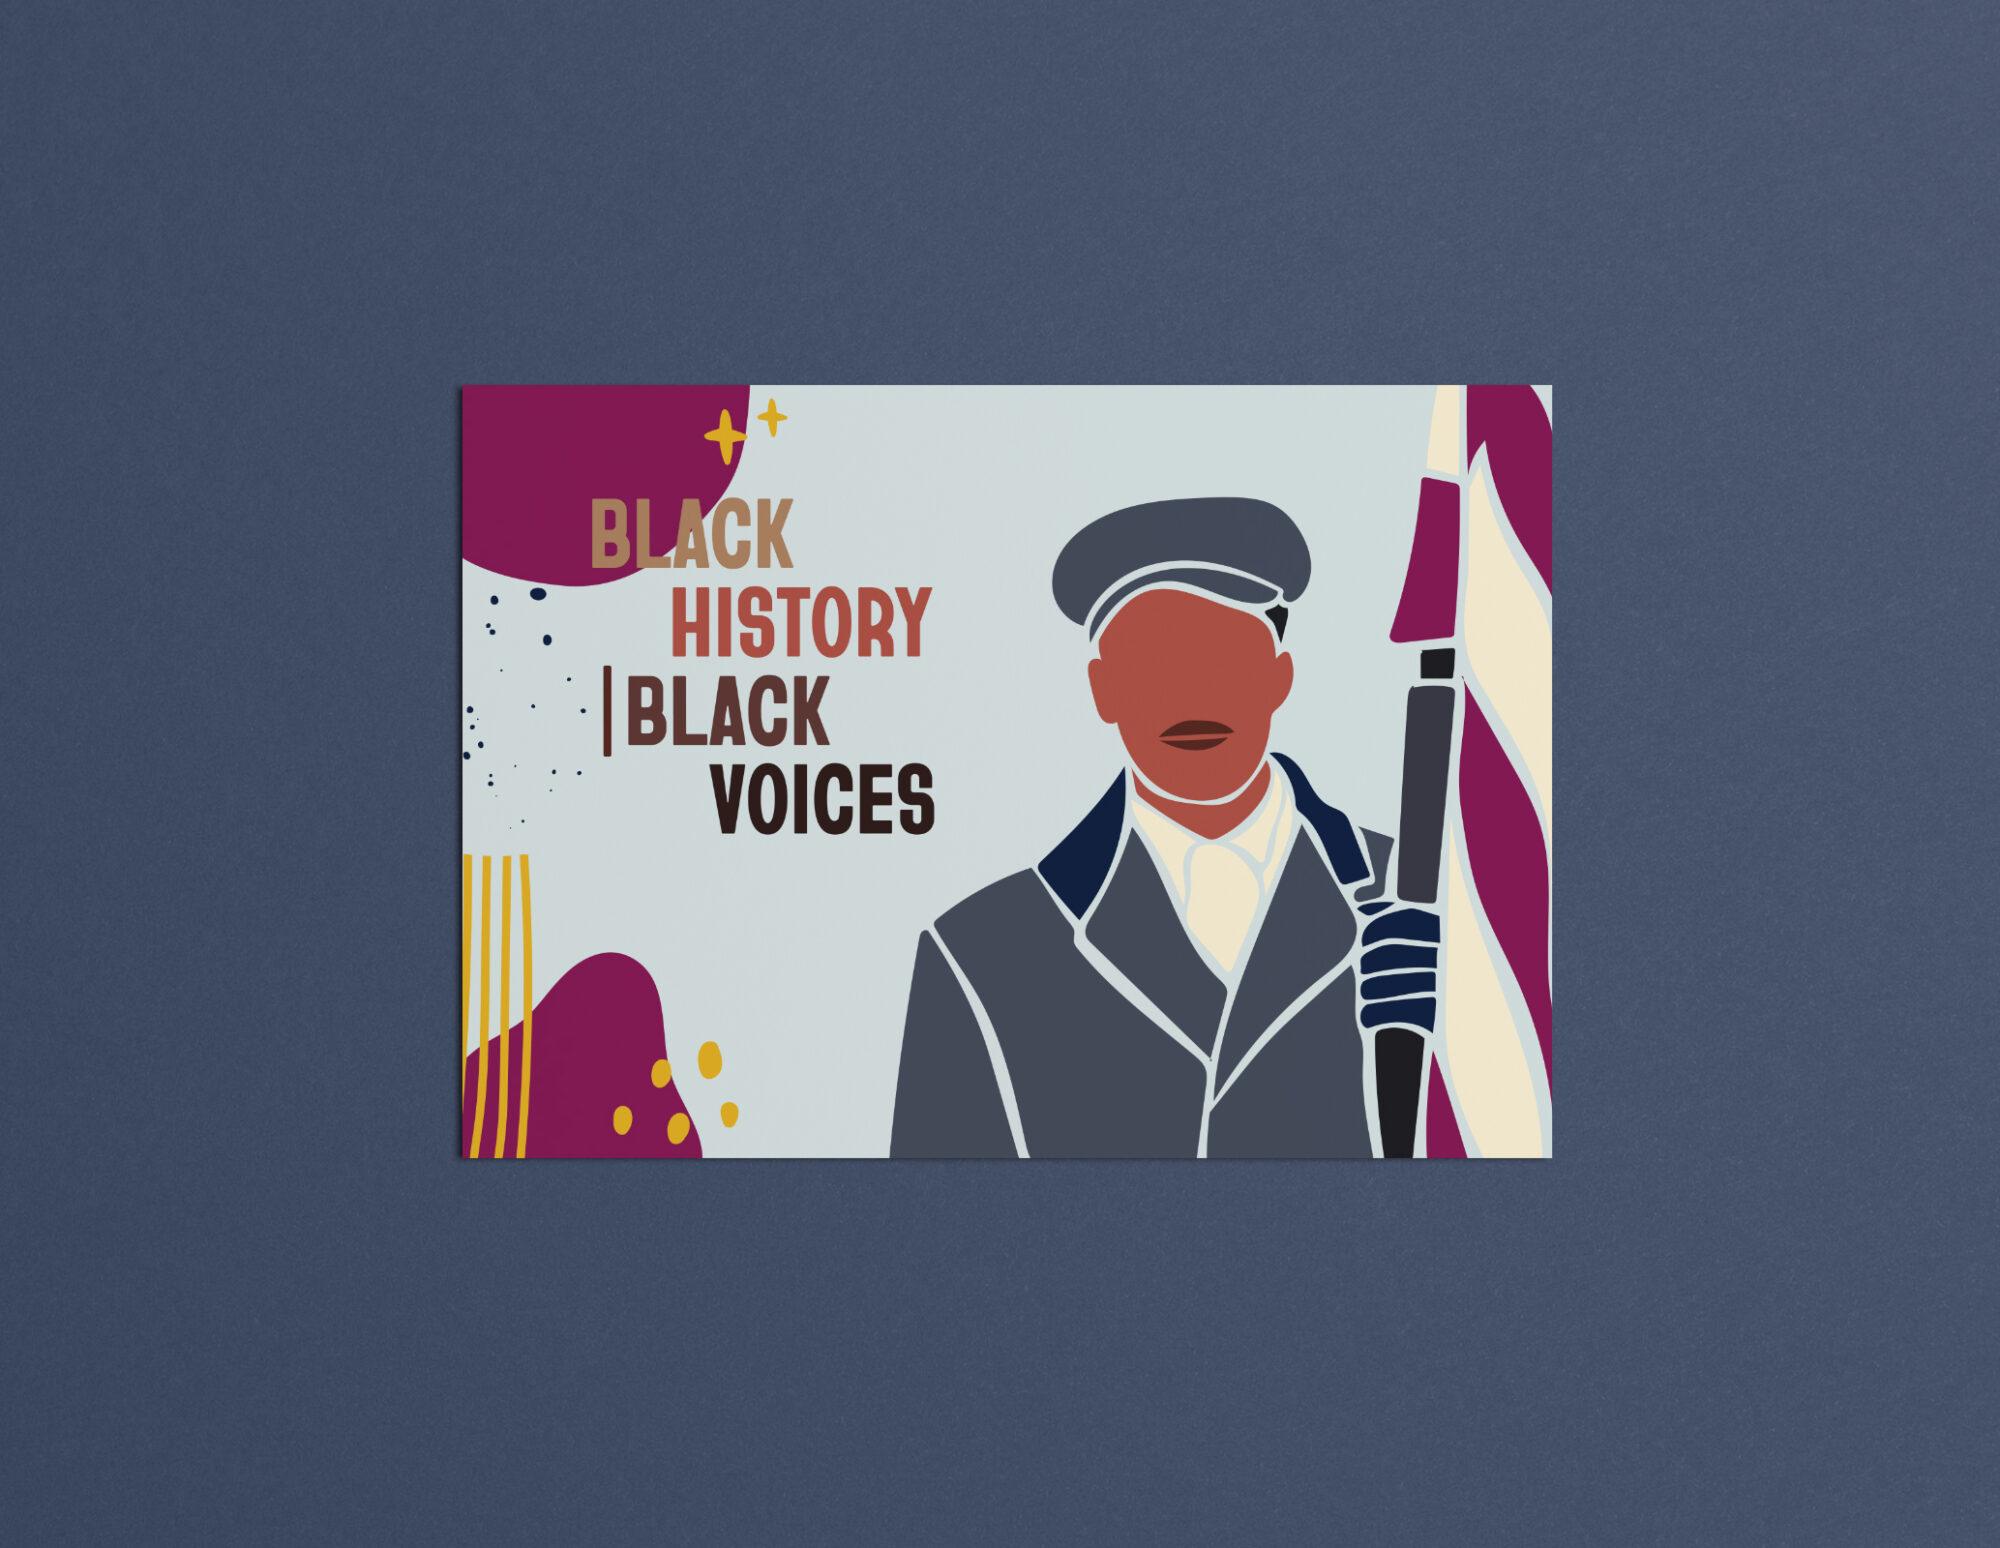 Black History Black Voices Mockup